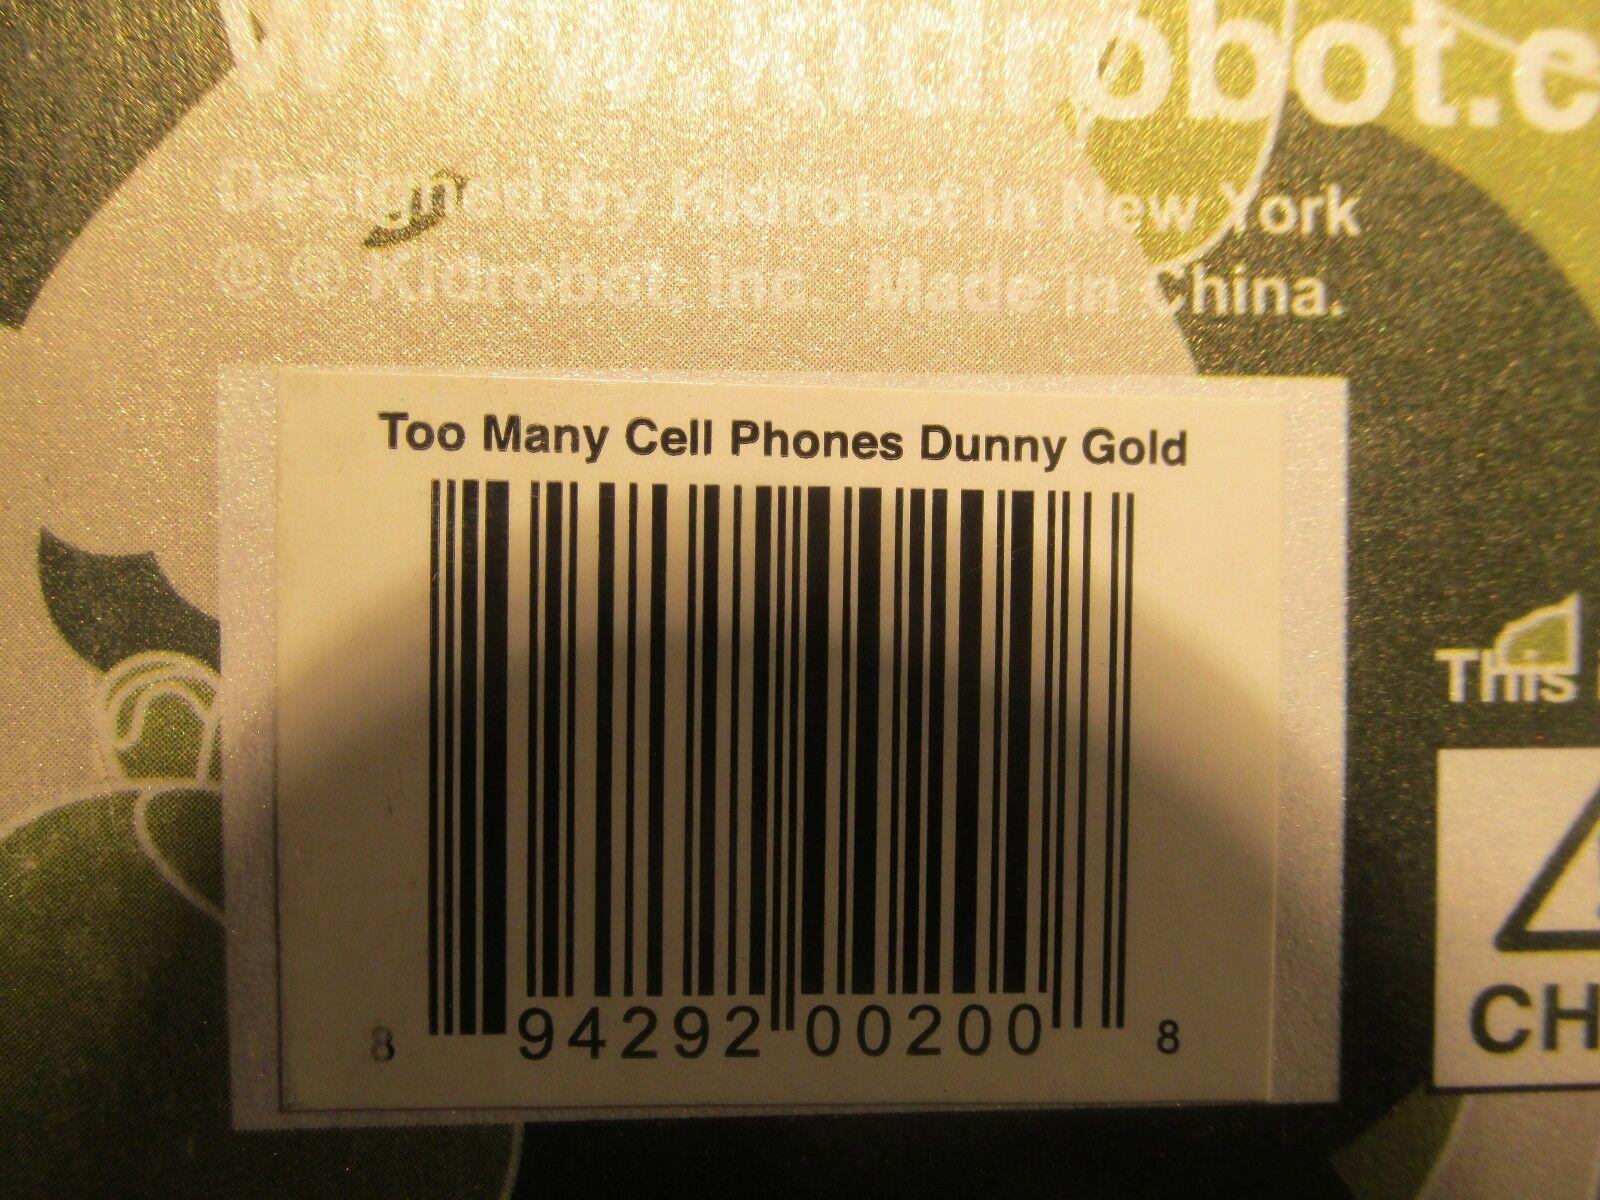 Kidrobot Kidrobot Kidrobot Too Many Cell Phones  oro Edition 8 Dunny 18 333 c1d1b8